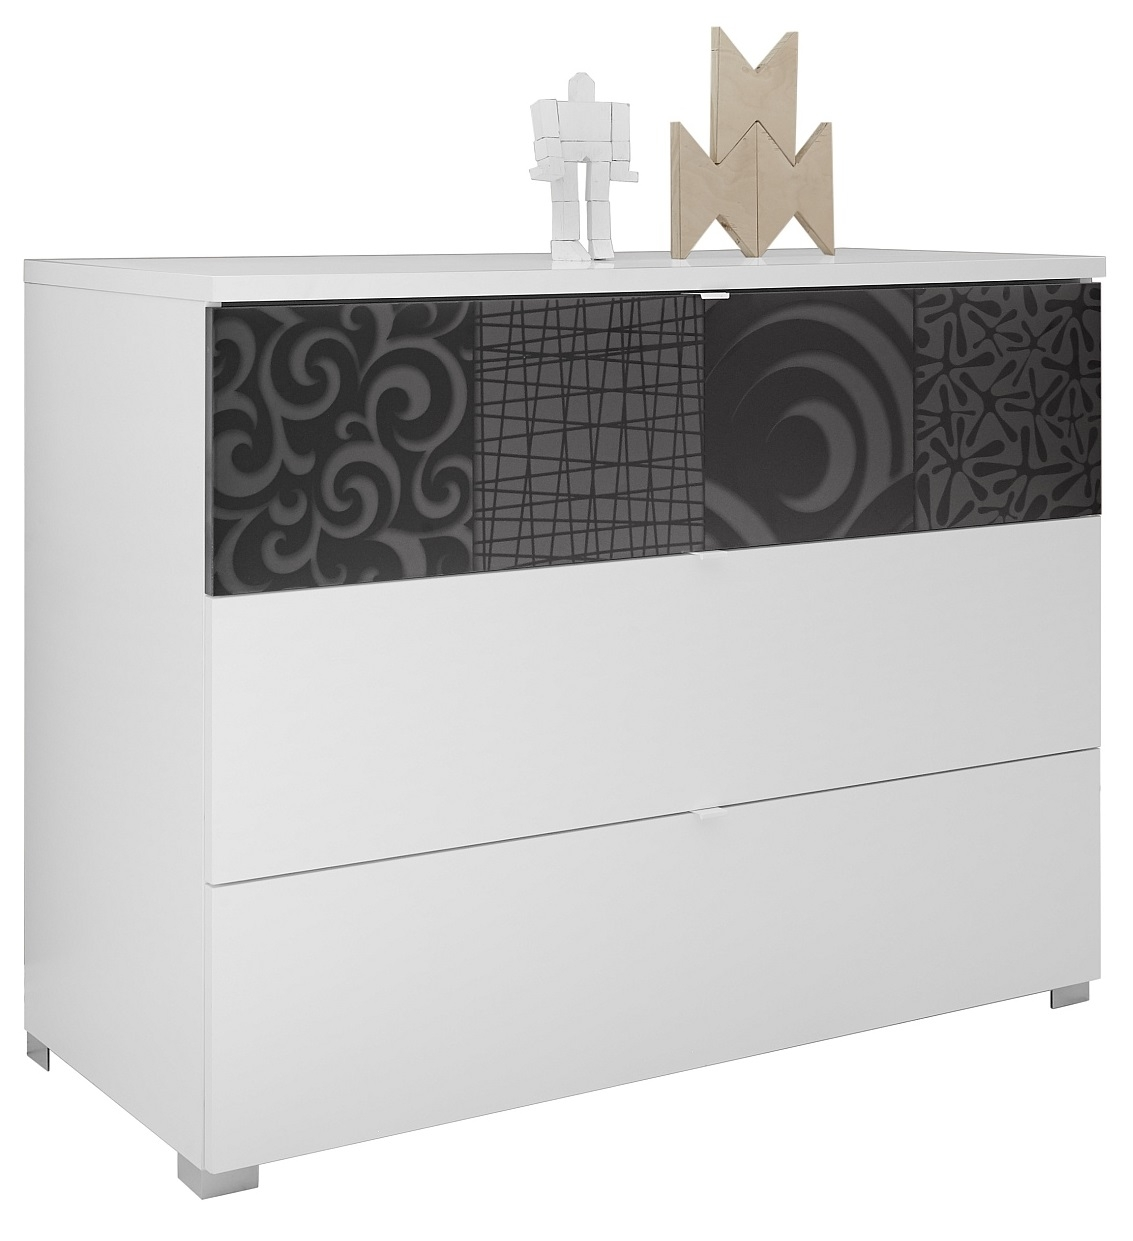 Commode Perez 104 cm breed in mat wit met hoogglans antraciet | Pesaro Mobilia